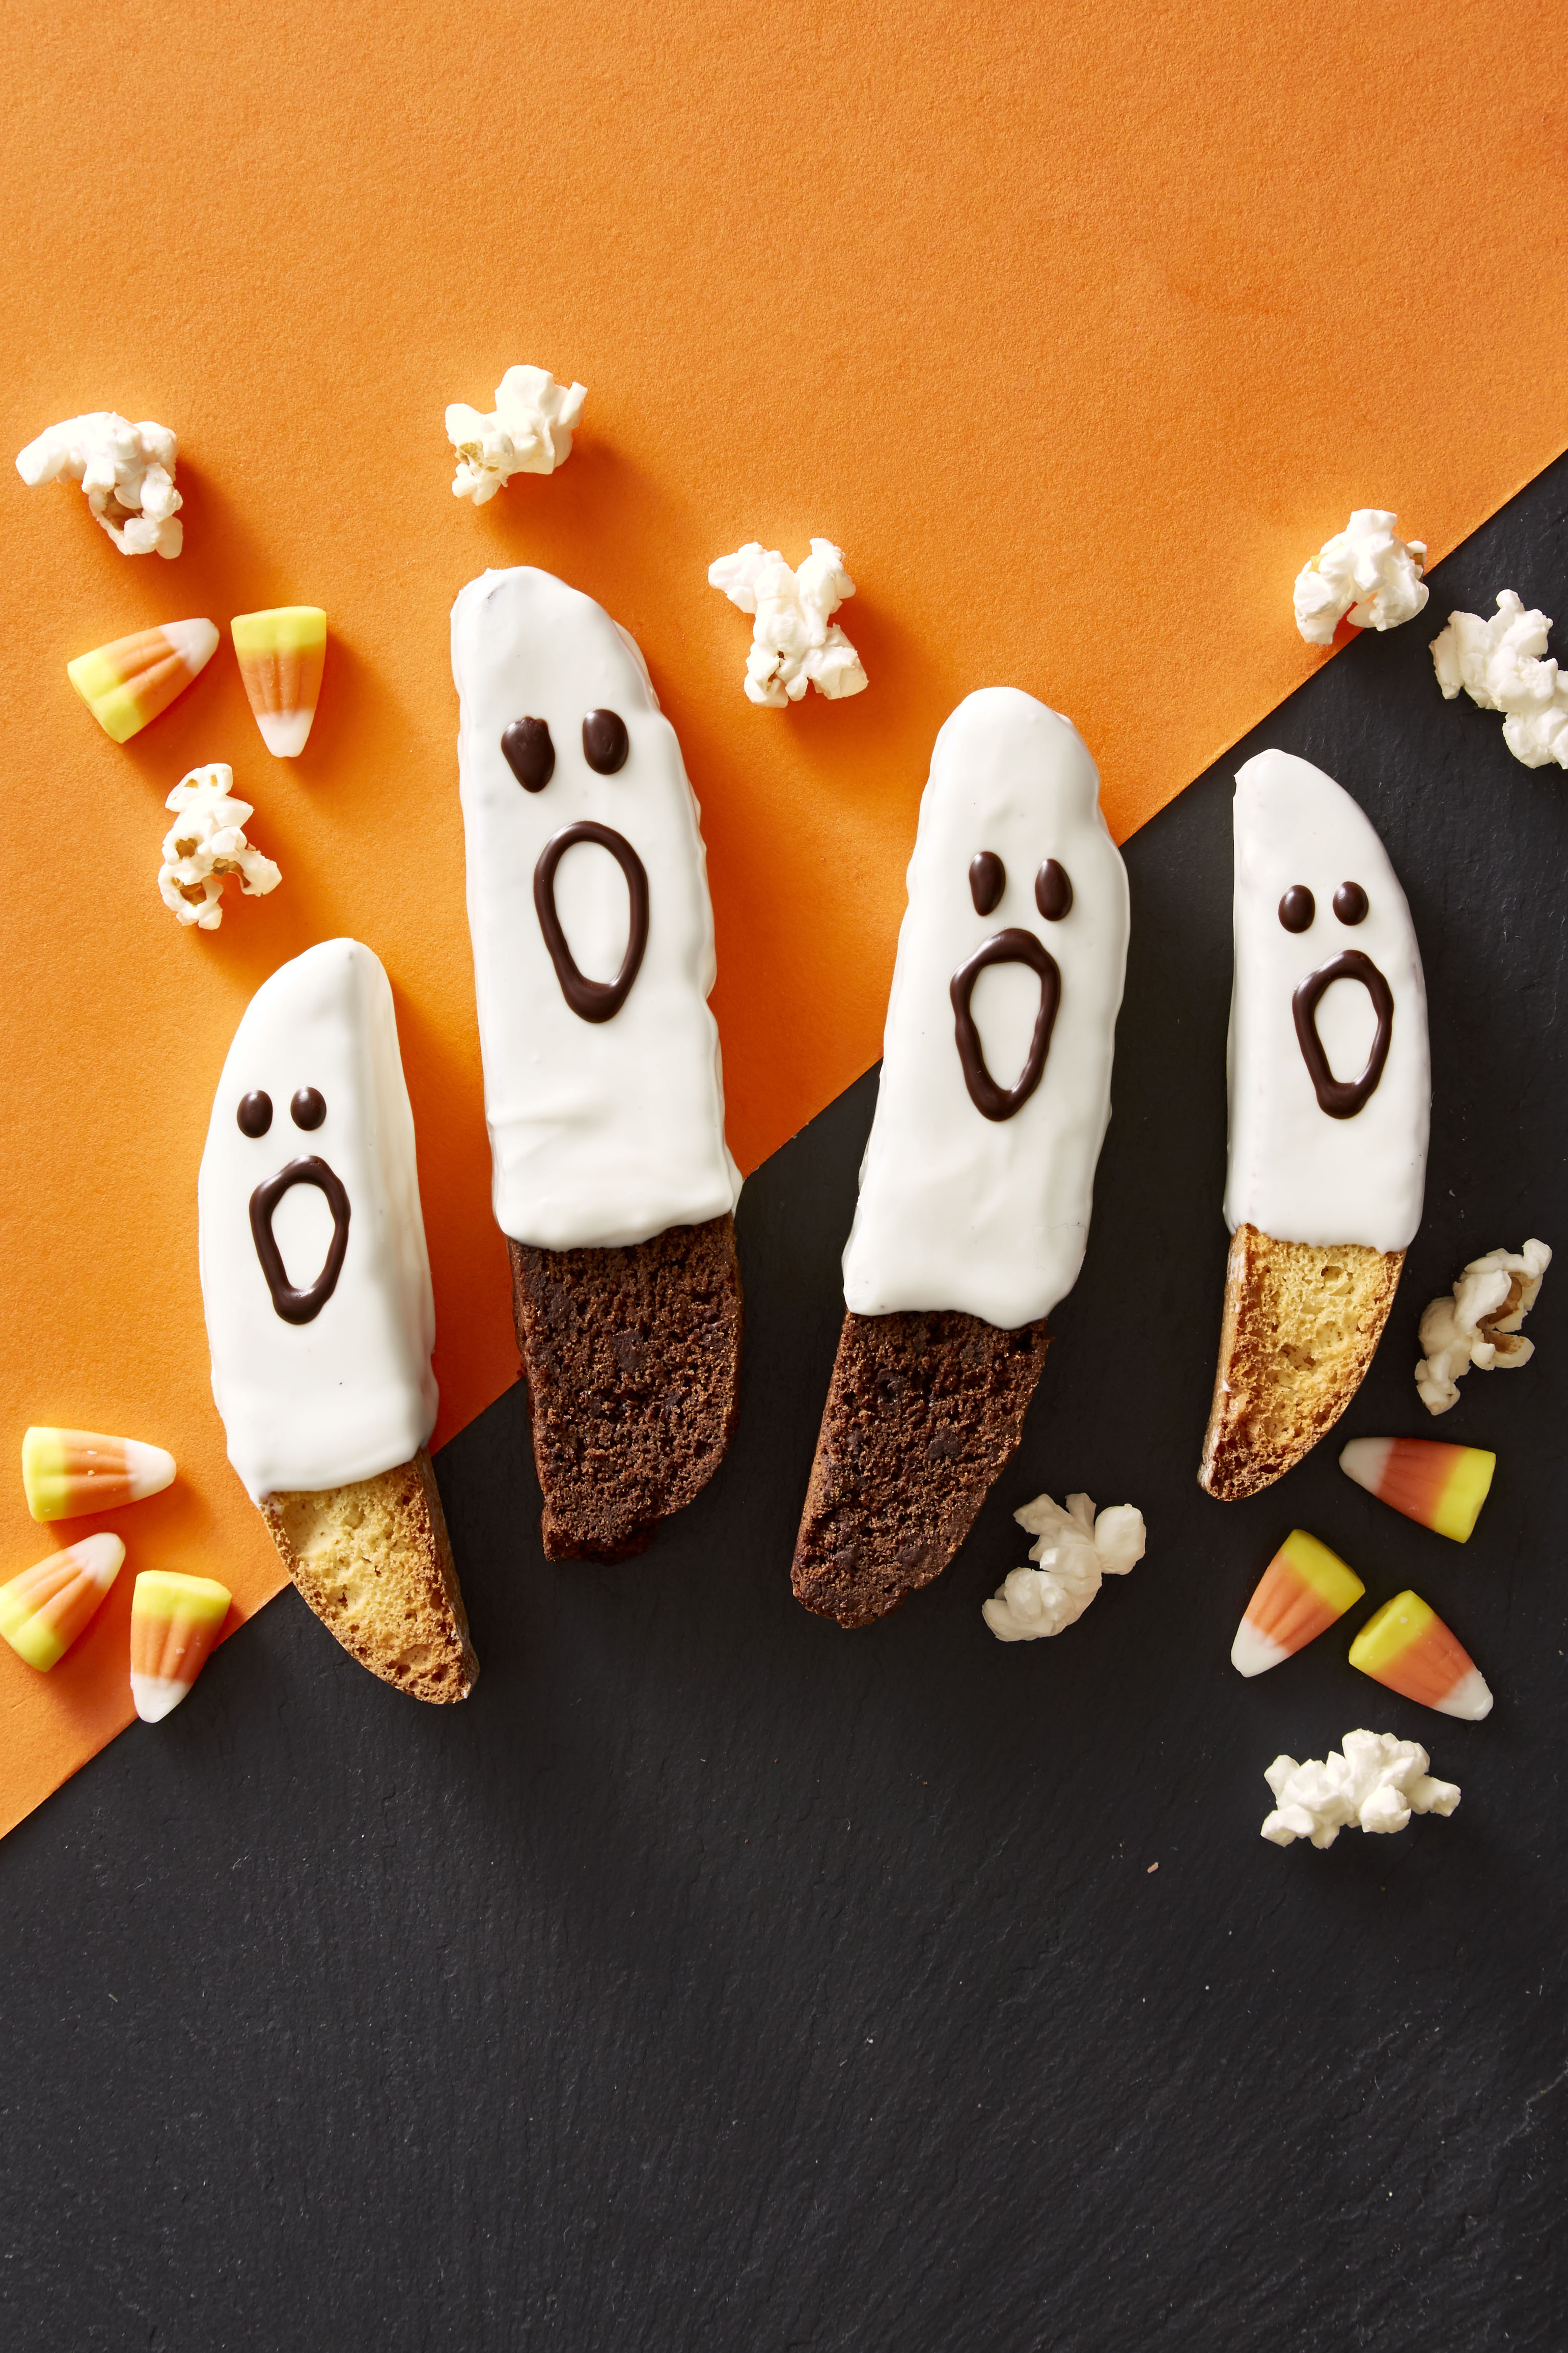 34 Best Halloween Party Snacks - Creepy Halloween Party ...